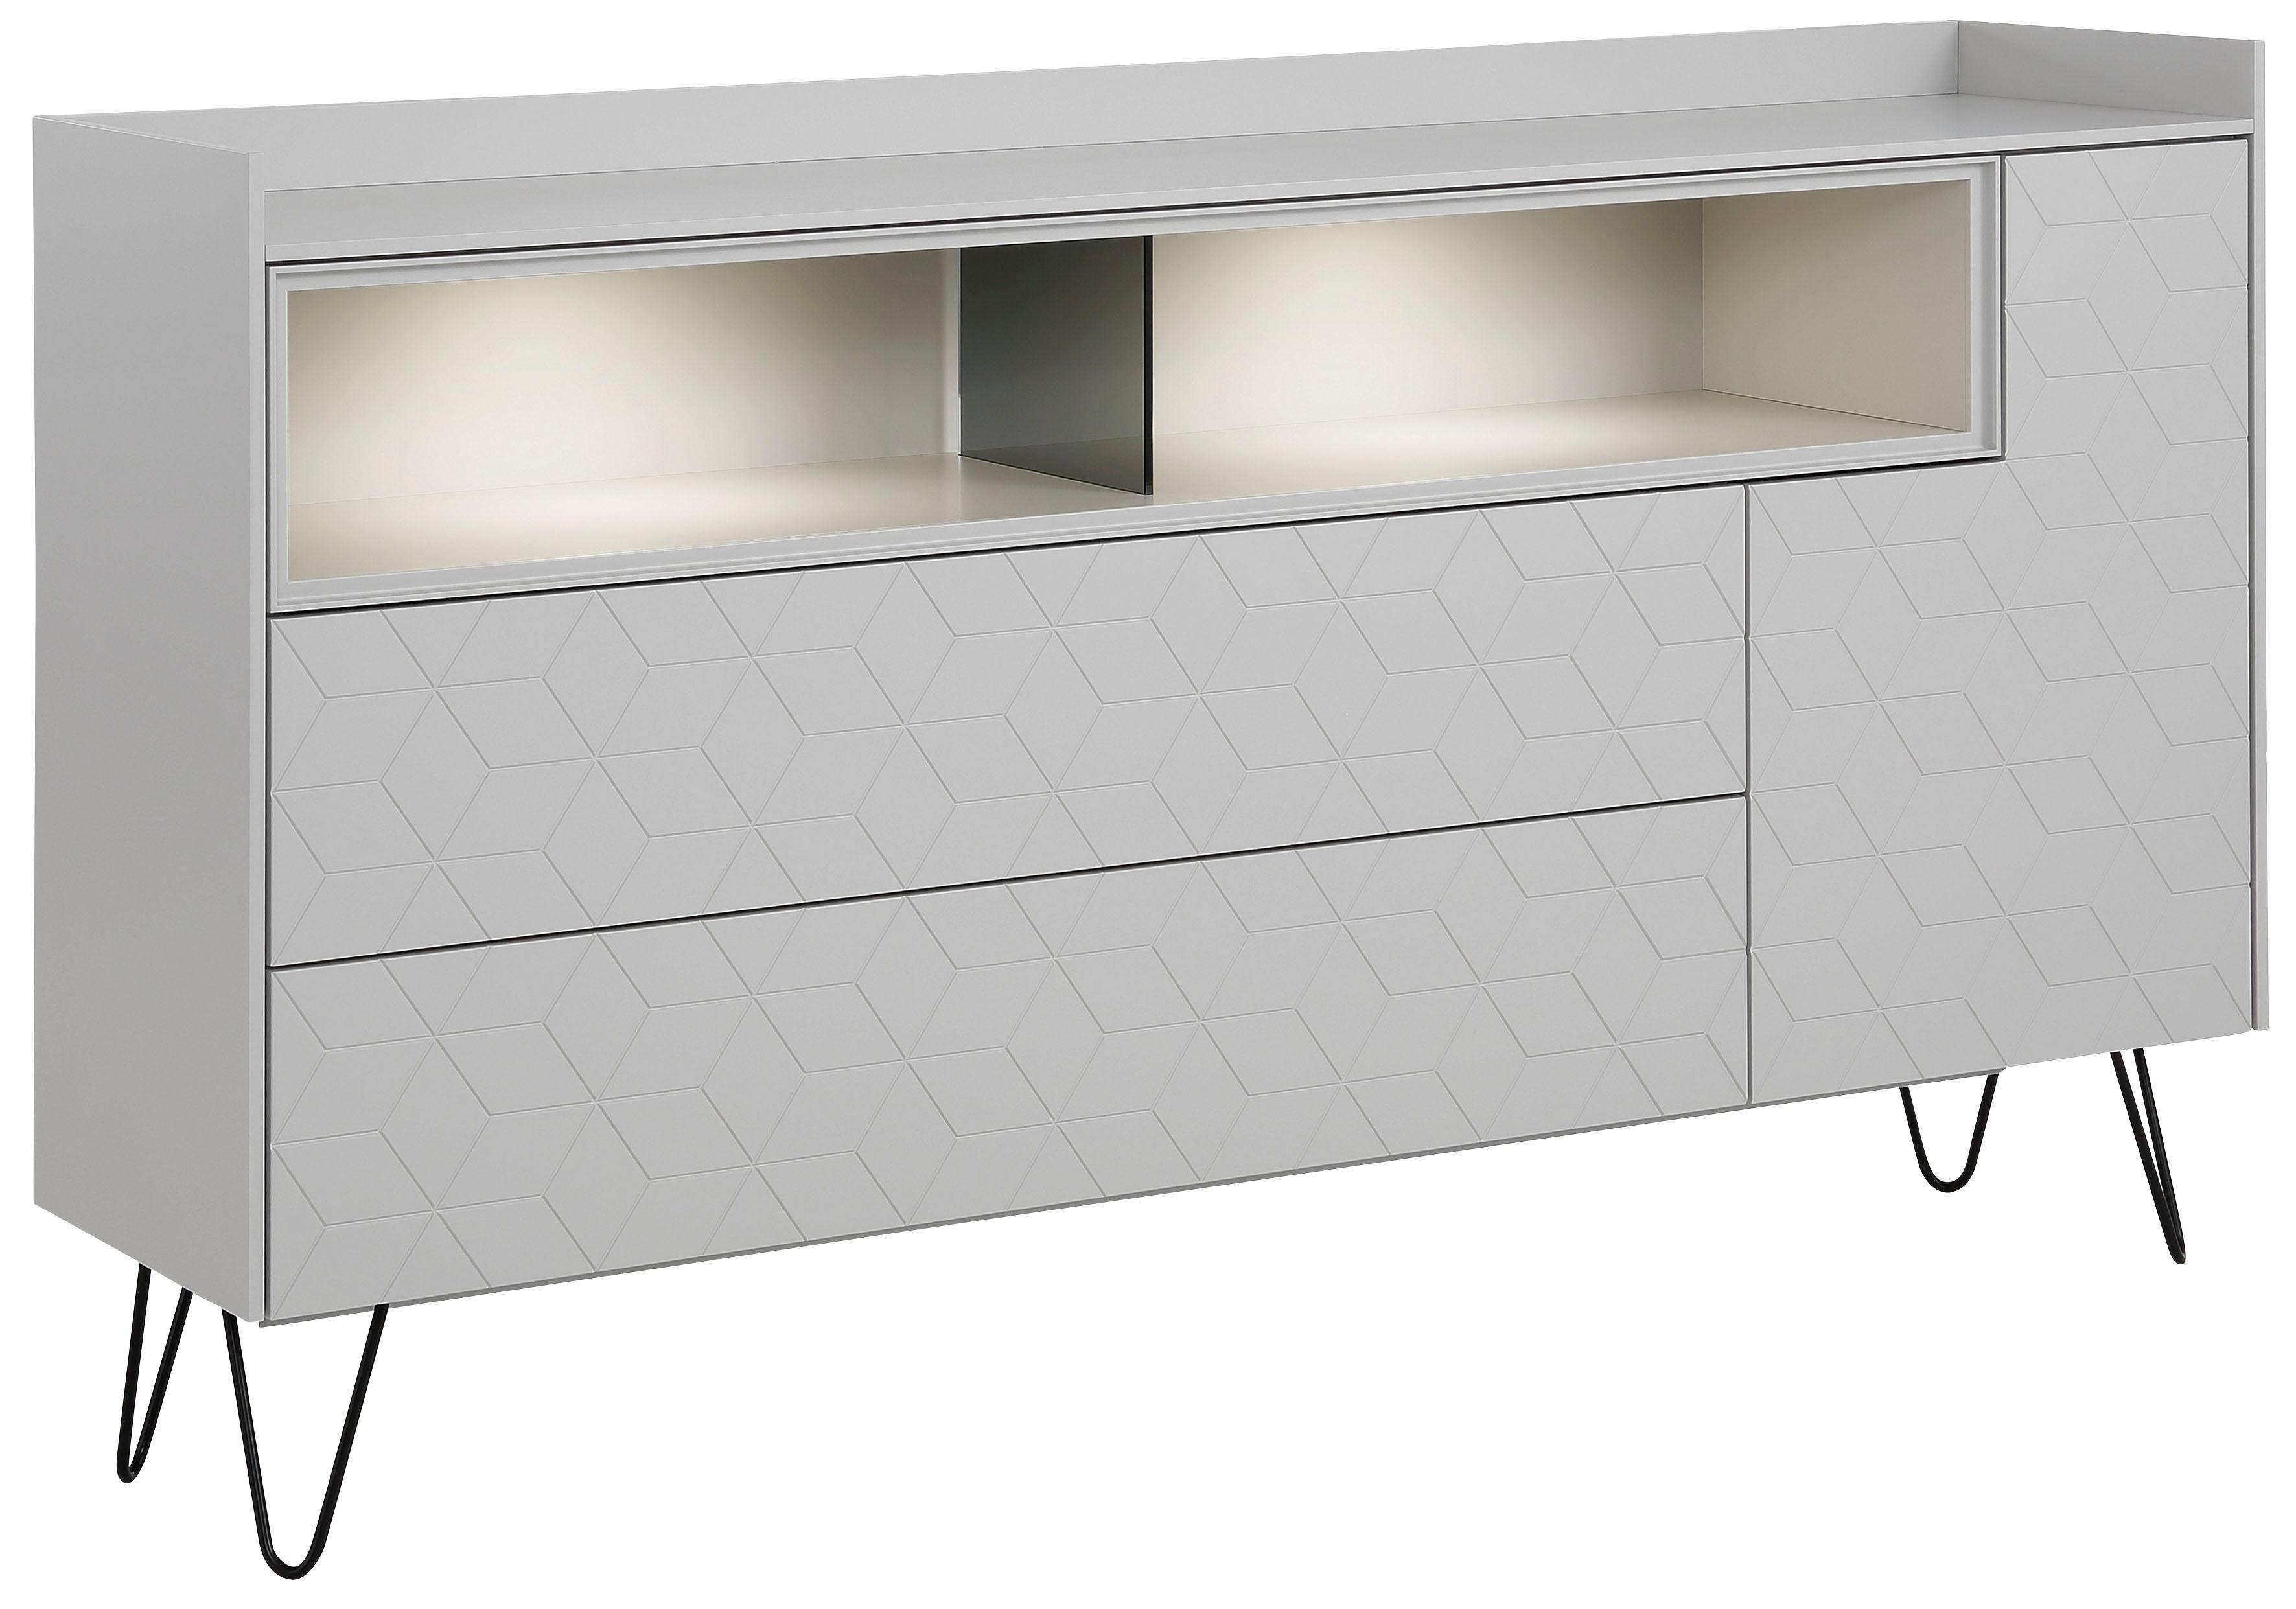 Villeroy & Boch Sideboard MOSAÏQUE Amara carré